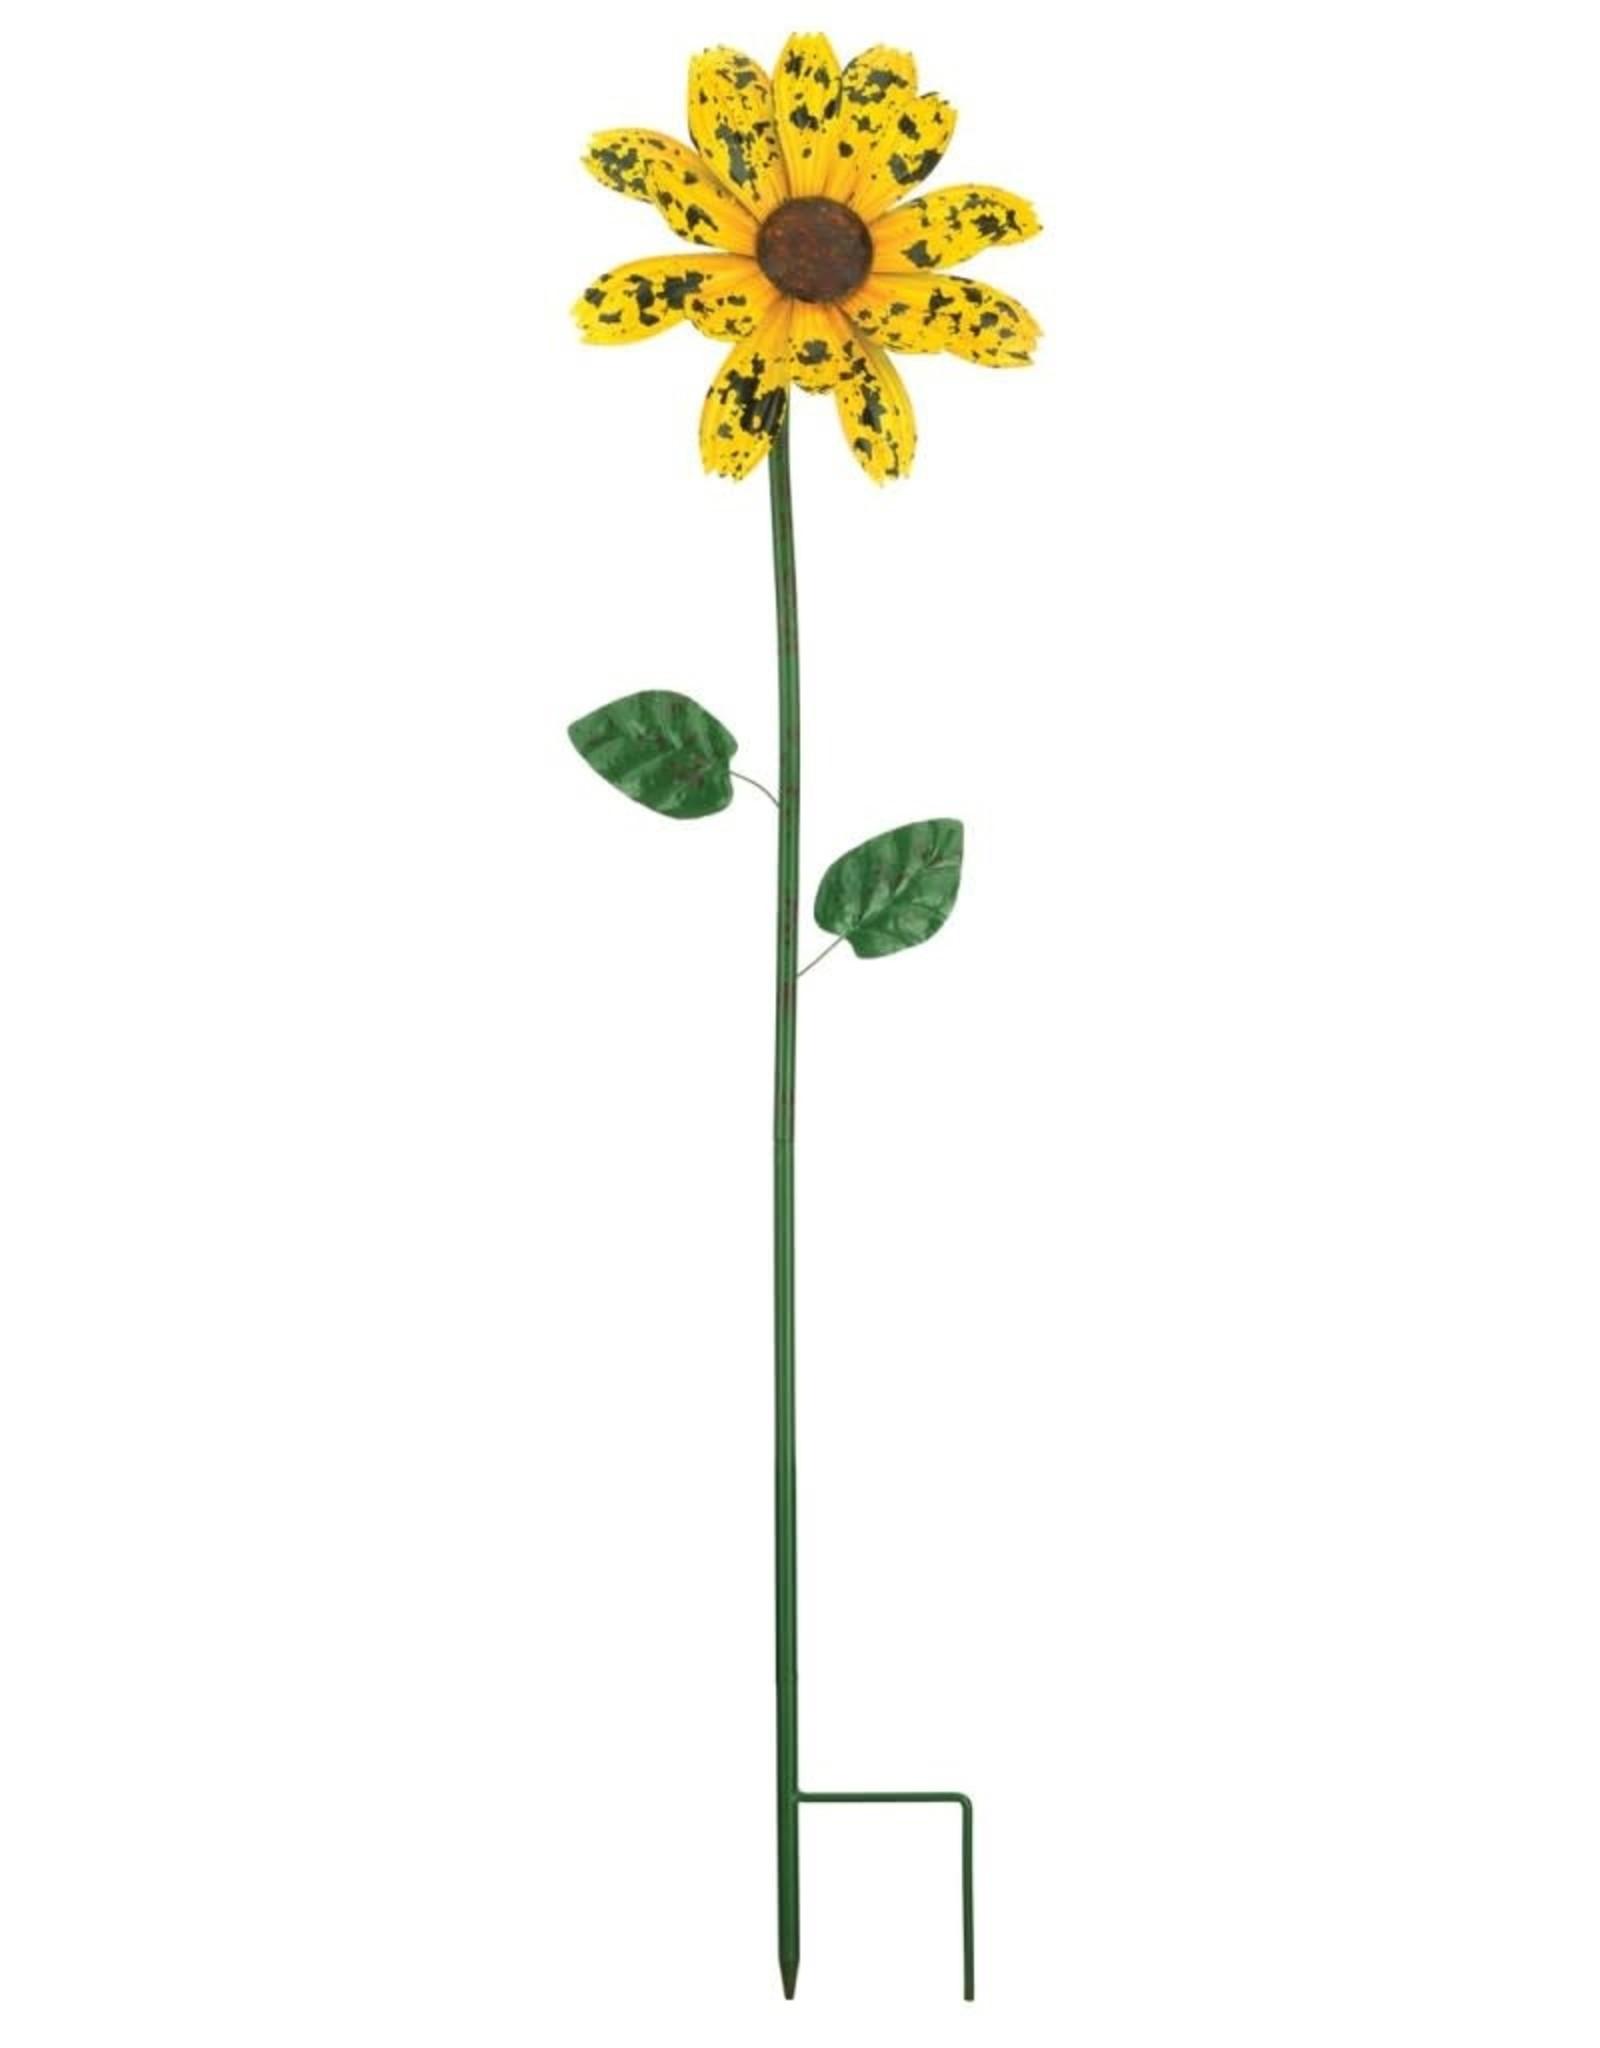 Rustic Flower Stake - Marigold 46''